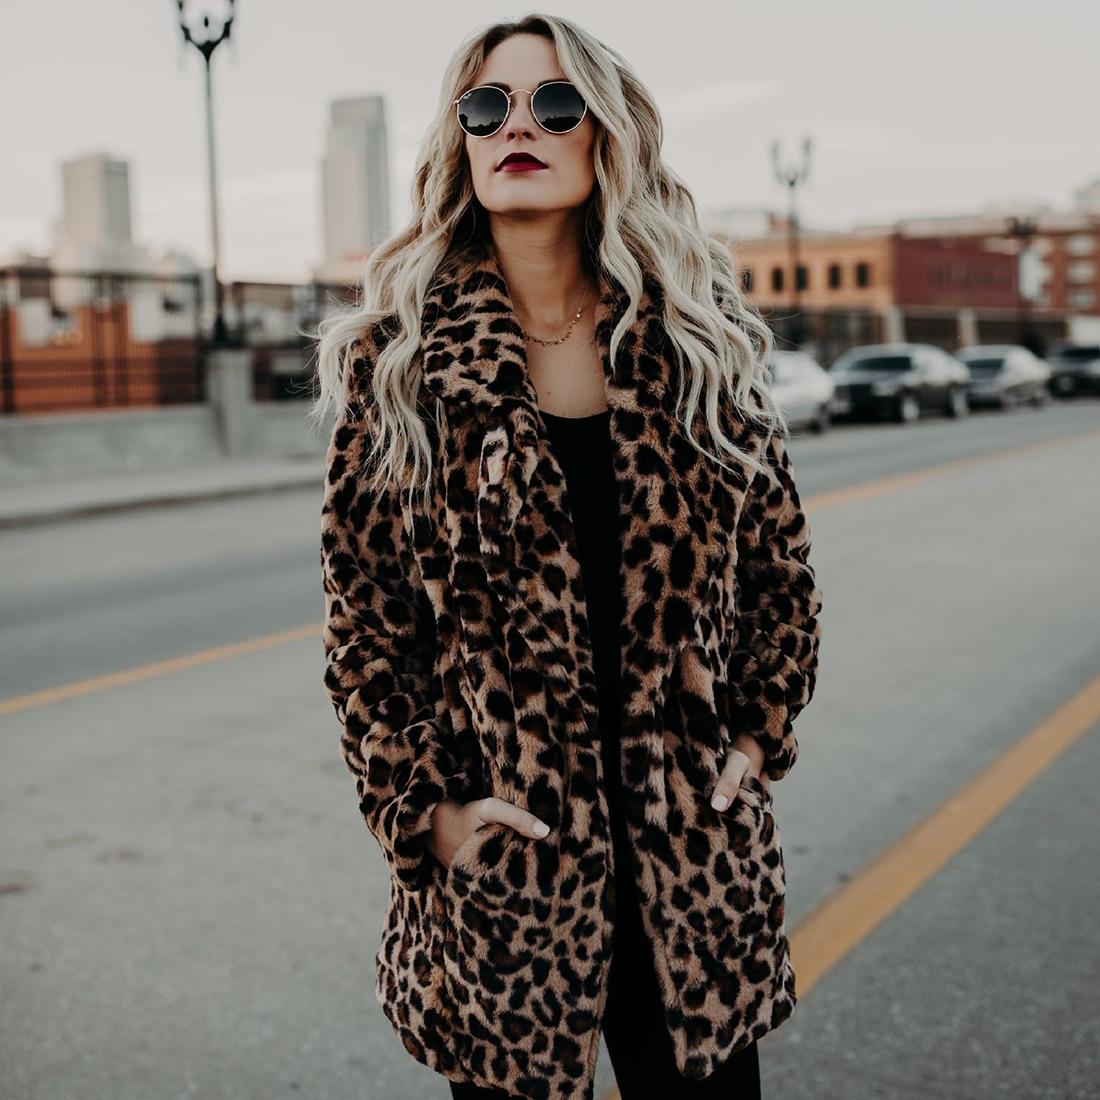 Leopard Faux Fur Plush Hairy Coat Women Autumn Winter Plus Cashmere Fluffy Outwear Elegant Warm Fake